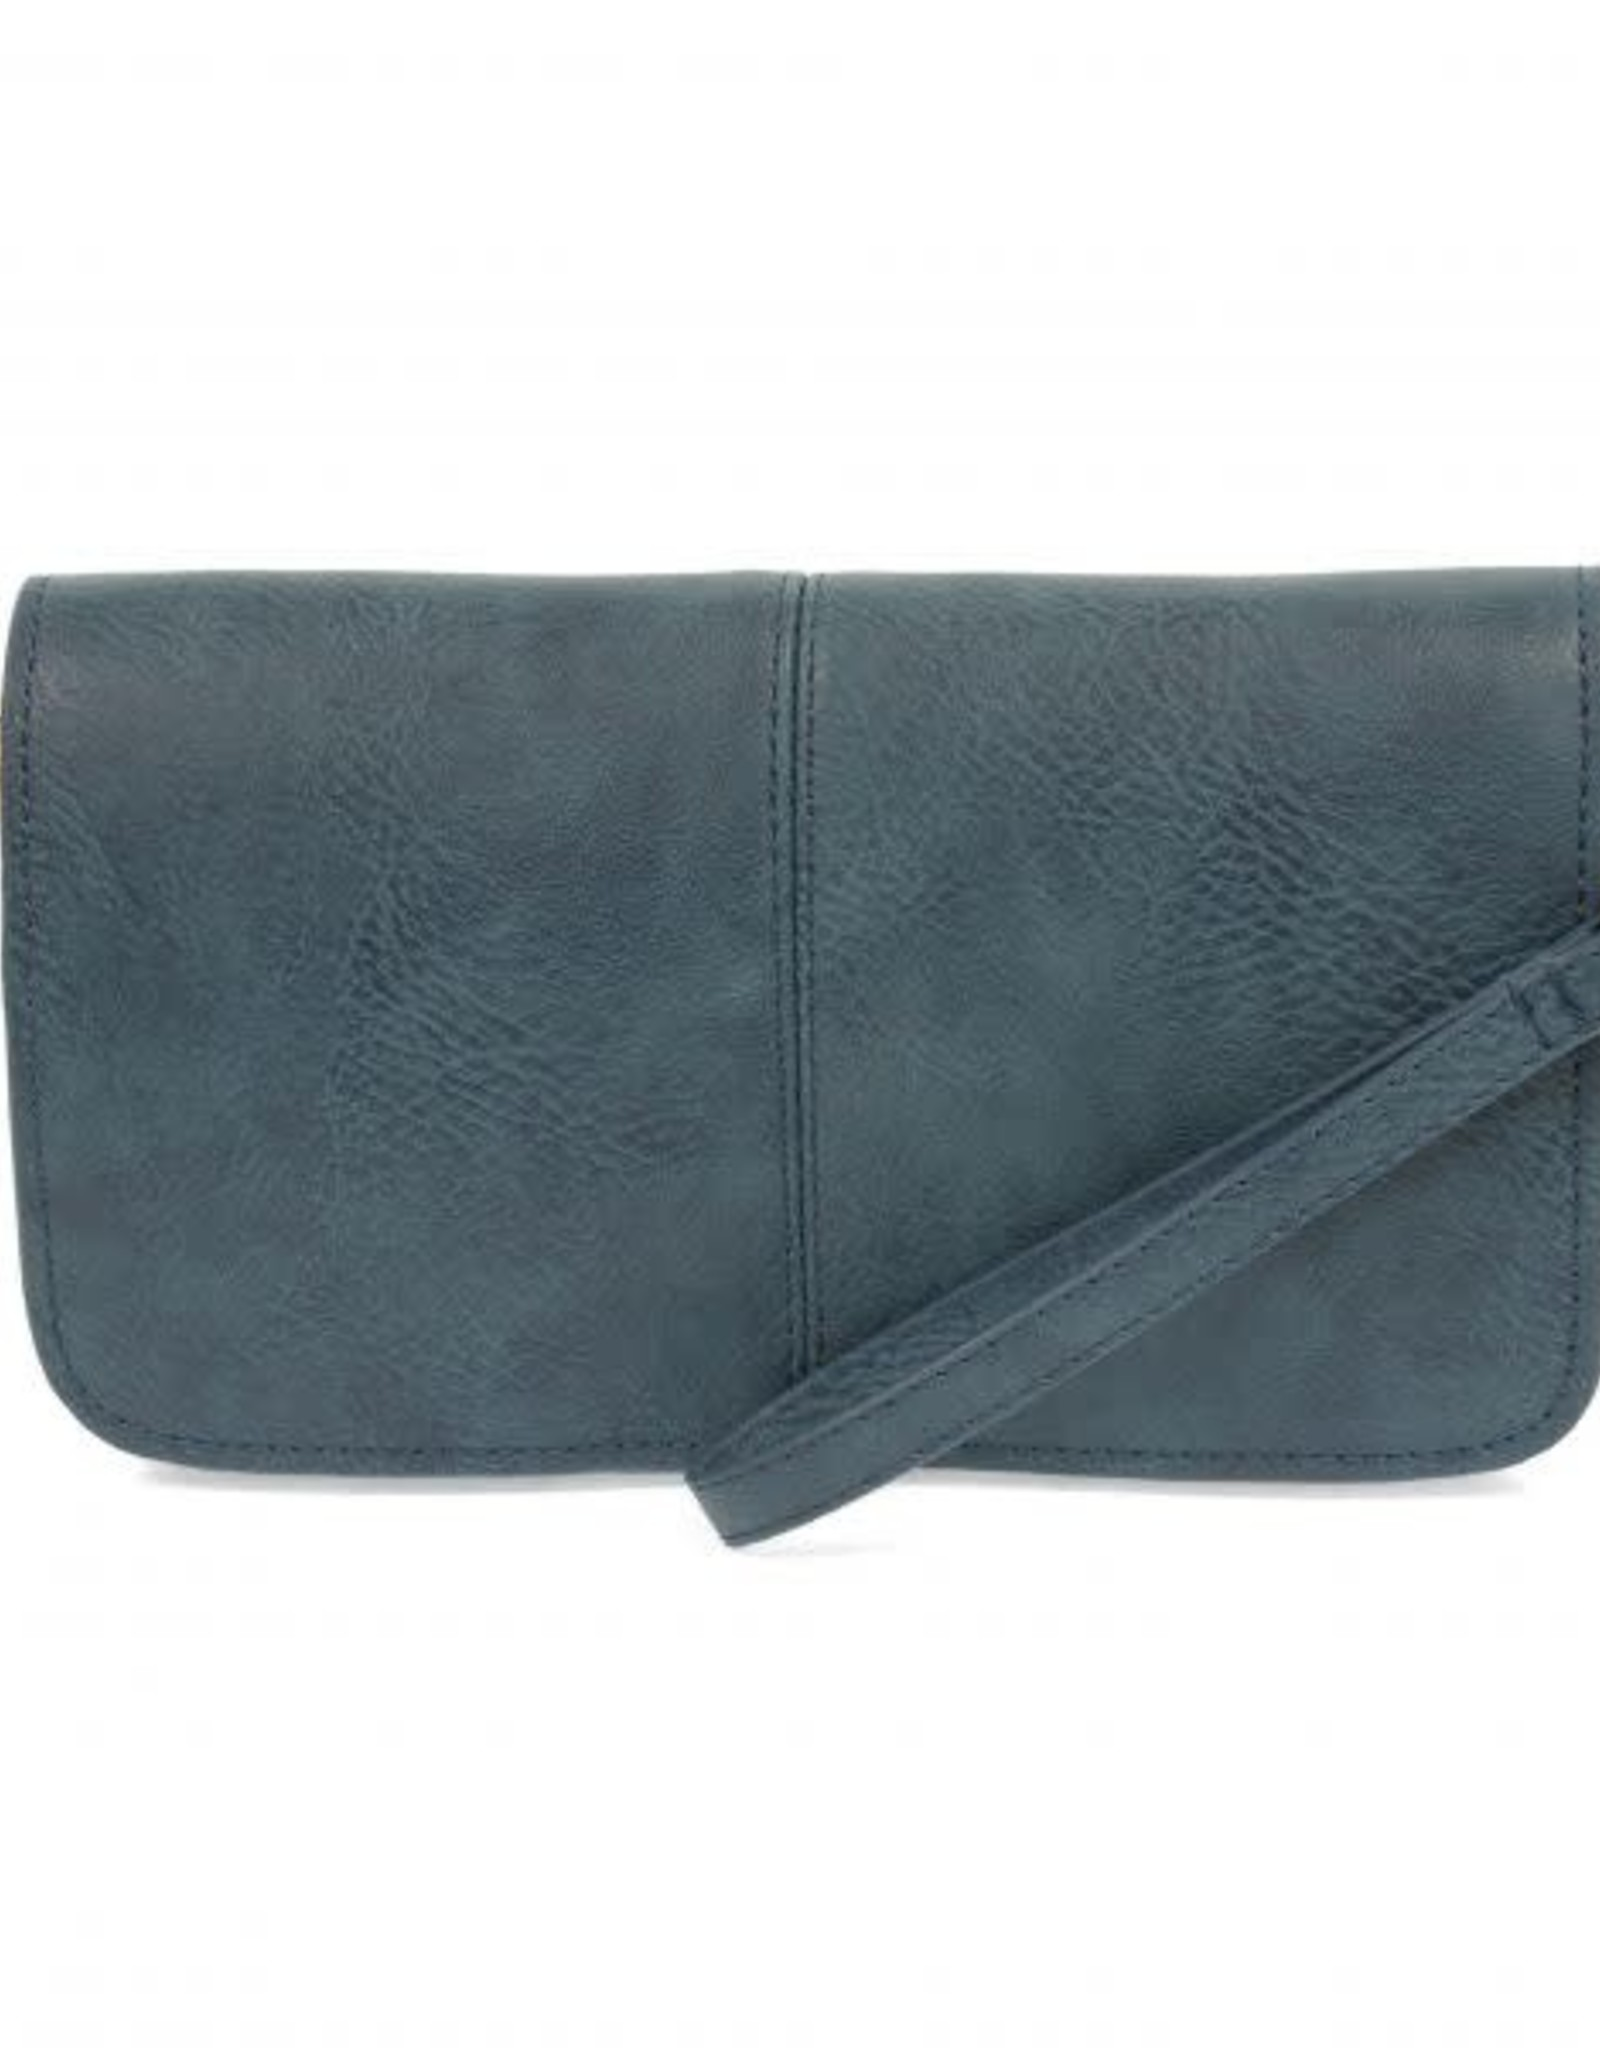 - Dark Chambray Multi Pocket Crossbody Clutch